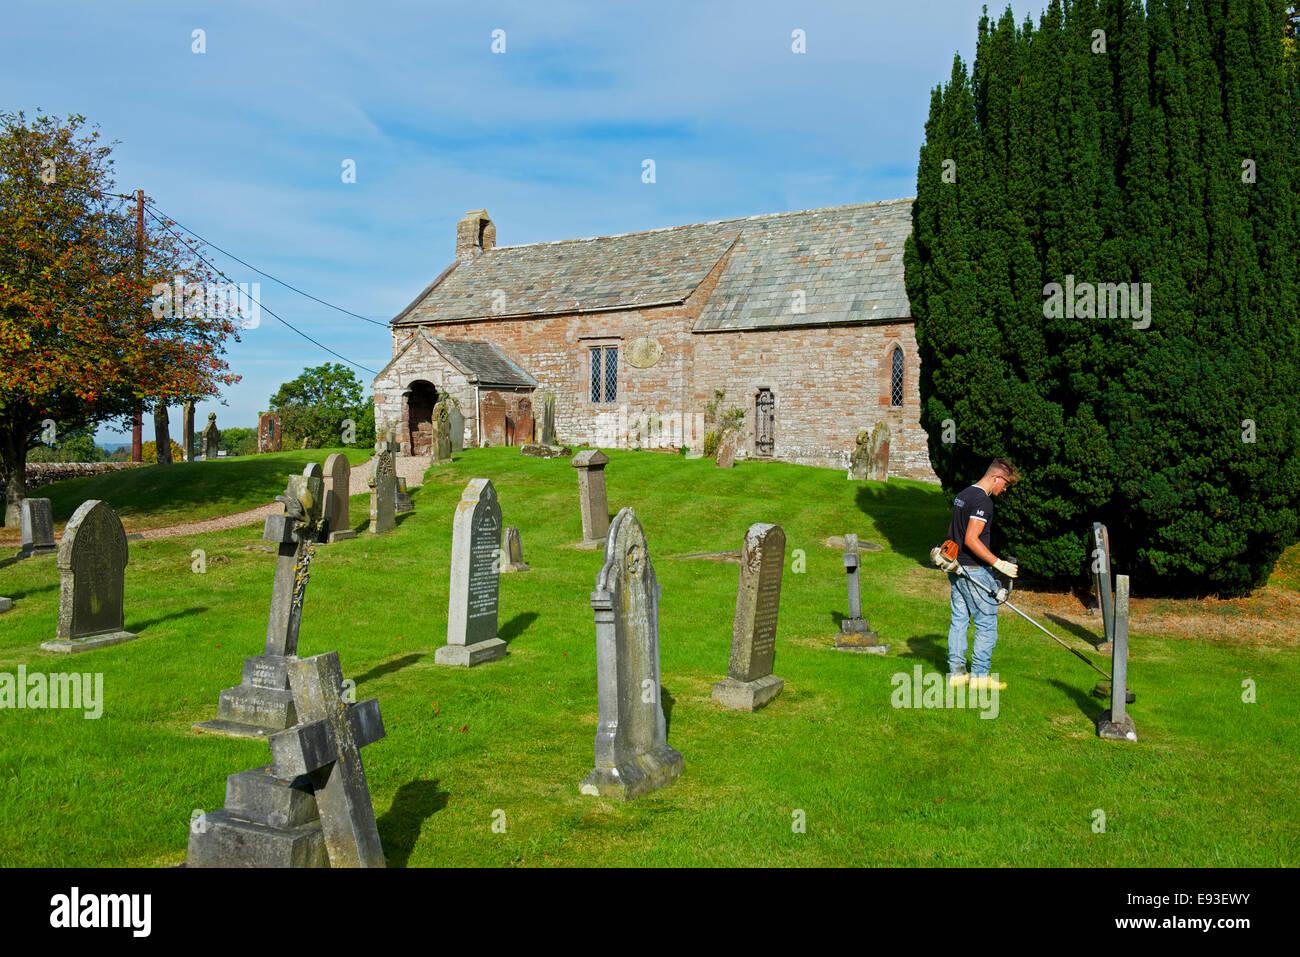 St Cuthbert's Church, Clifton, Cumbria, England UK - Stock Image